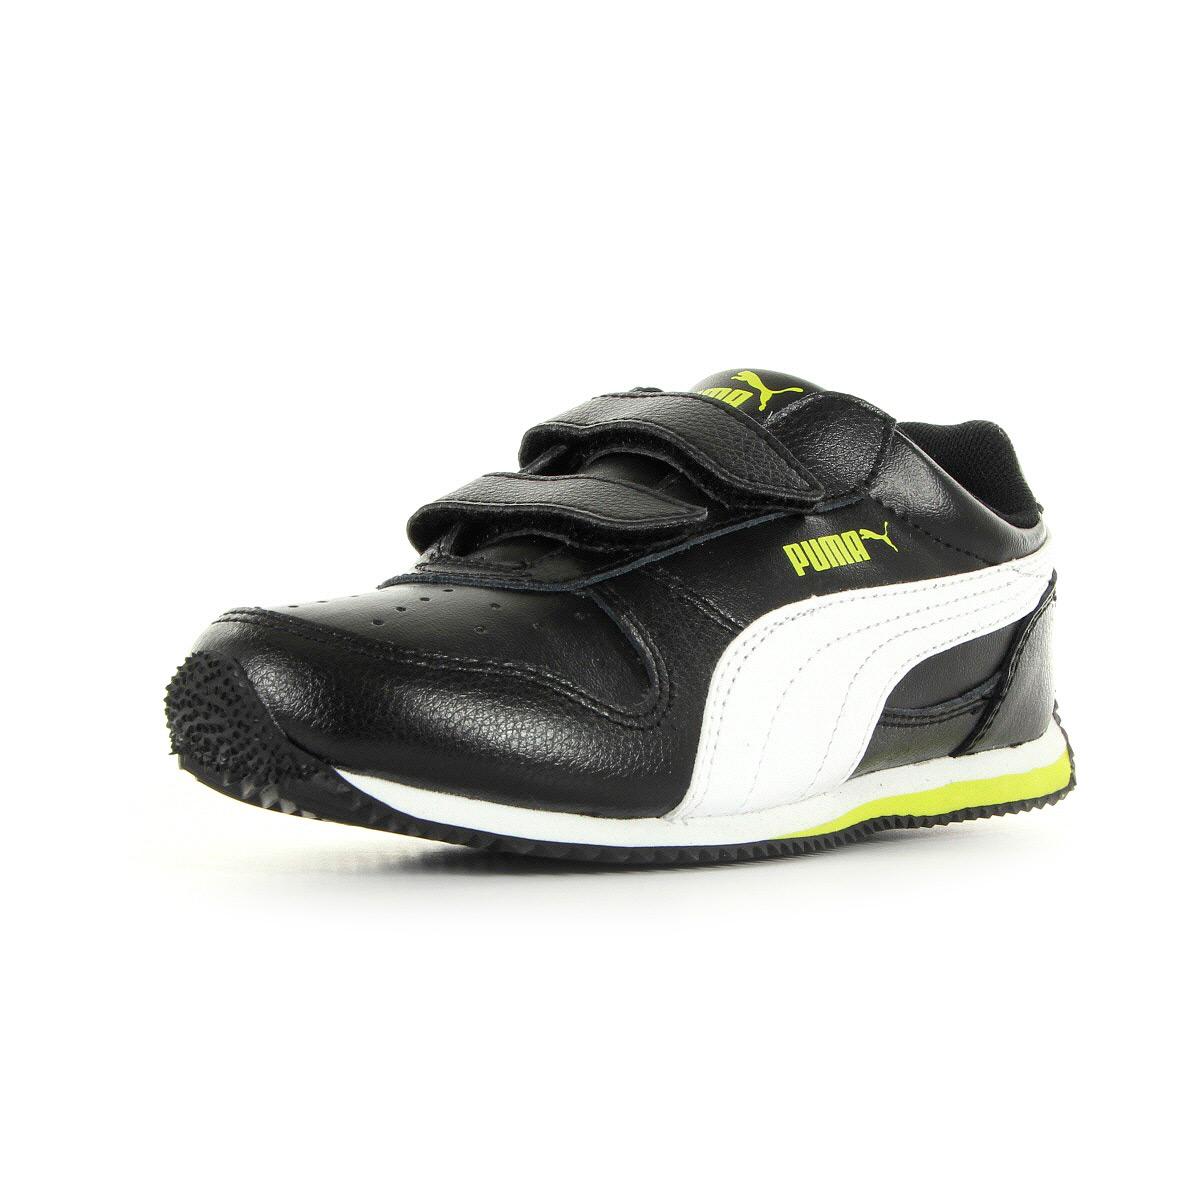 Chaussures Puma Fille Noir